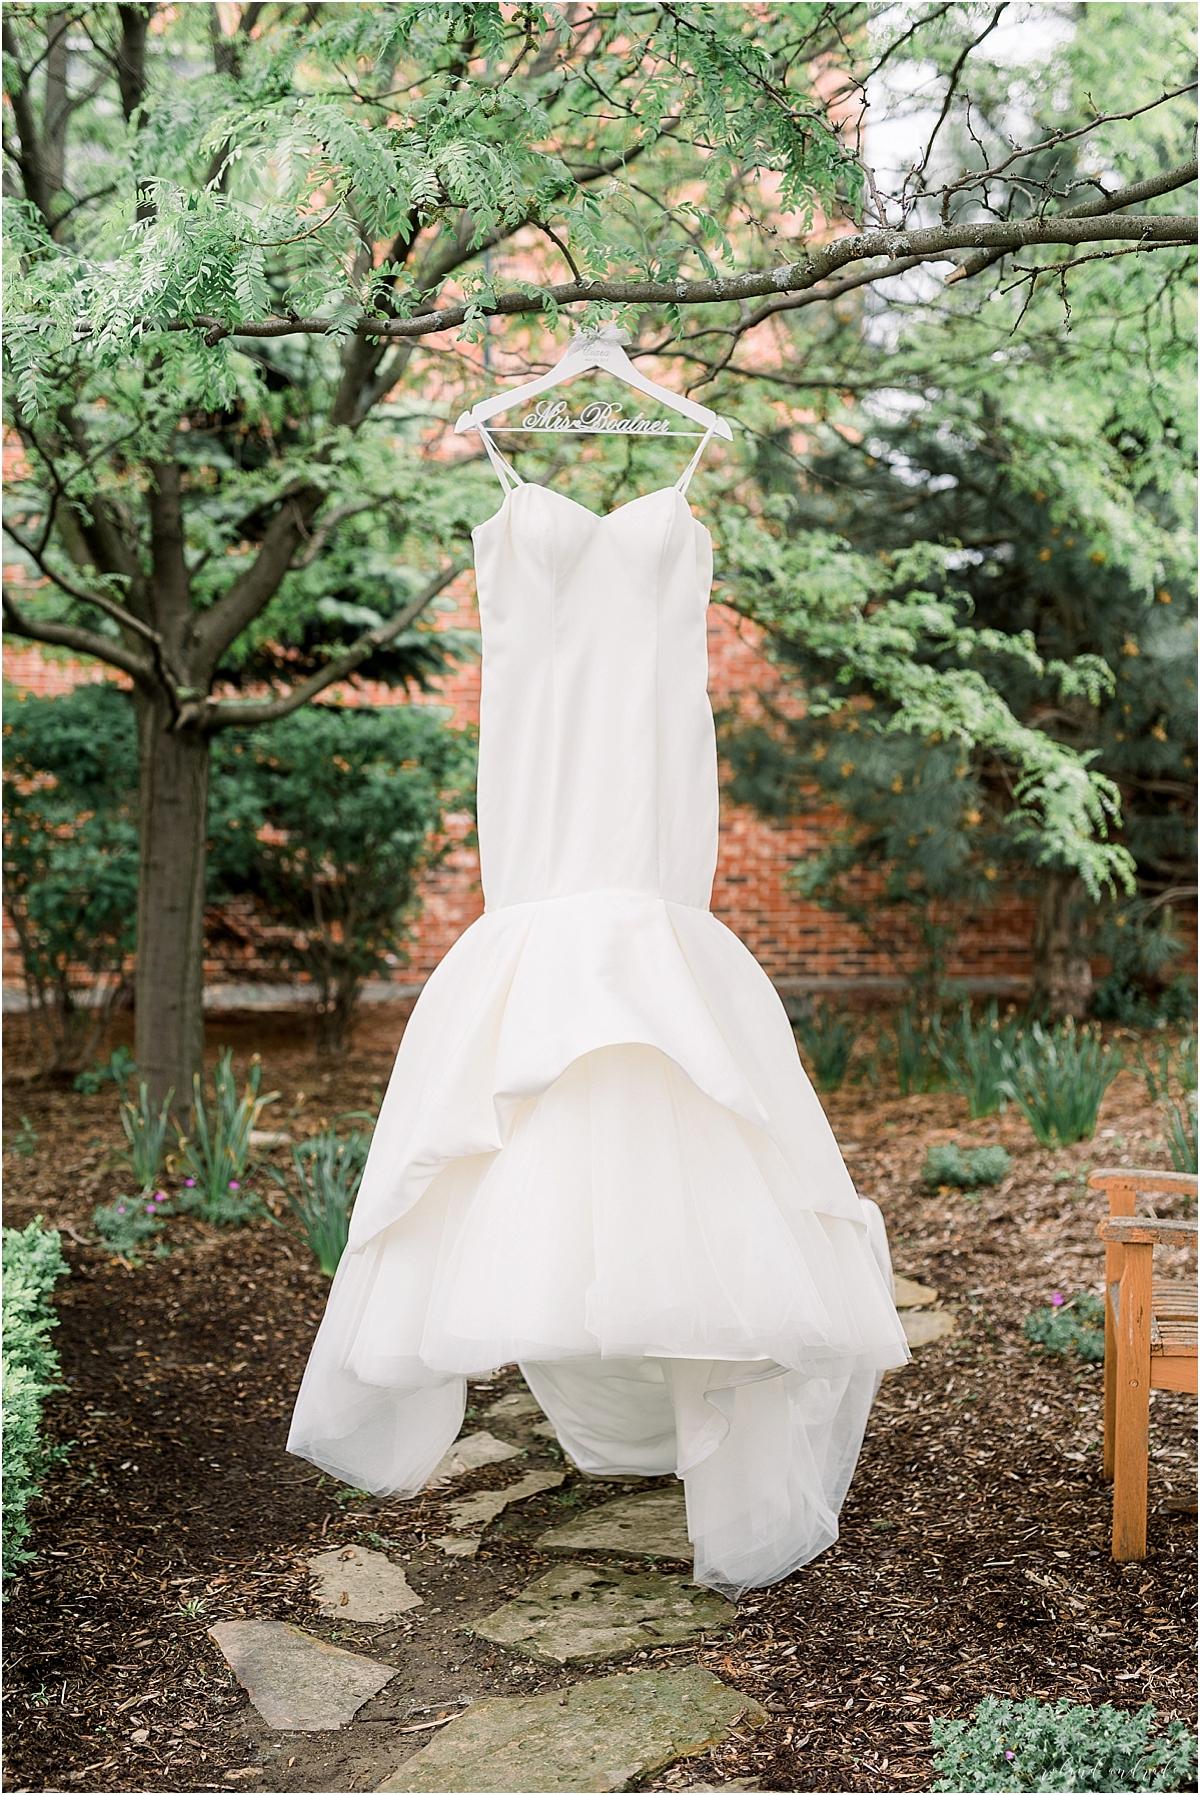 The Odyssey Wedding, Tinley Park Wedding, Chicago Wedding Photographer, Best Photographer In Tineley Park, Best Photographer In Chicago, Light And Airy Photographer_0019.jpg